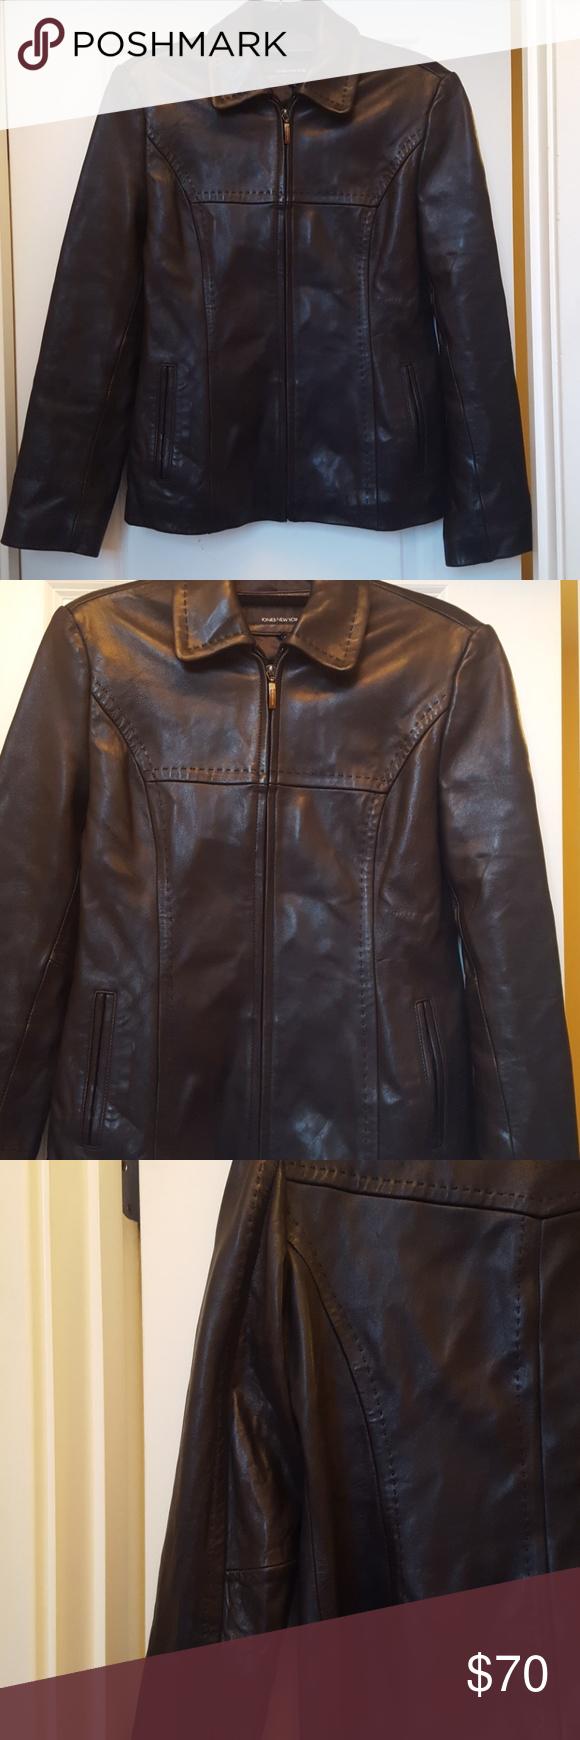 Jones New York Leather Jacket Leather Jacket Jones New York Clothes Design [ 1740 x 580 Pixel ]